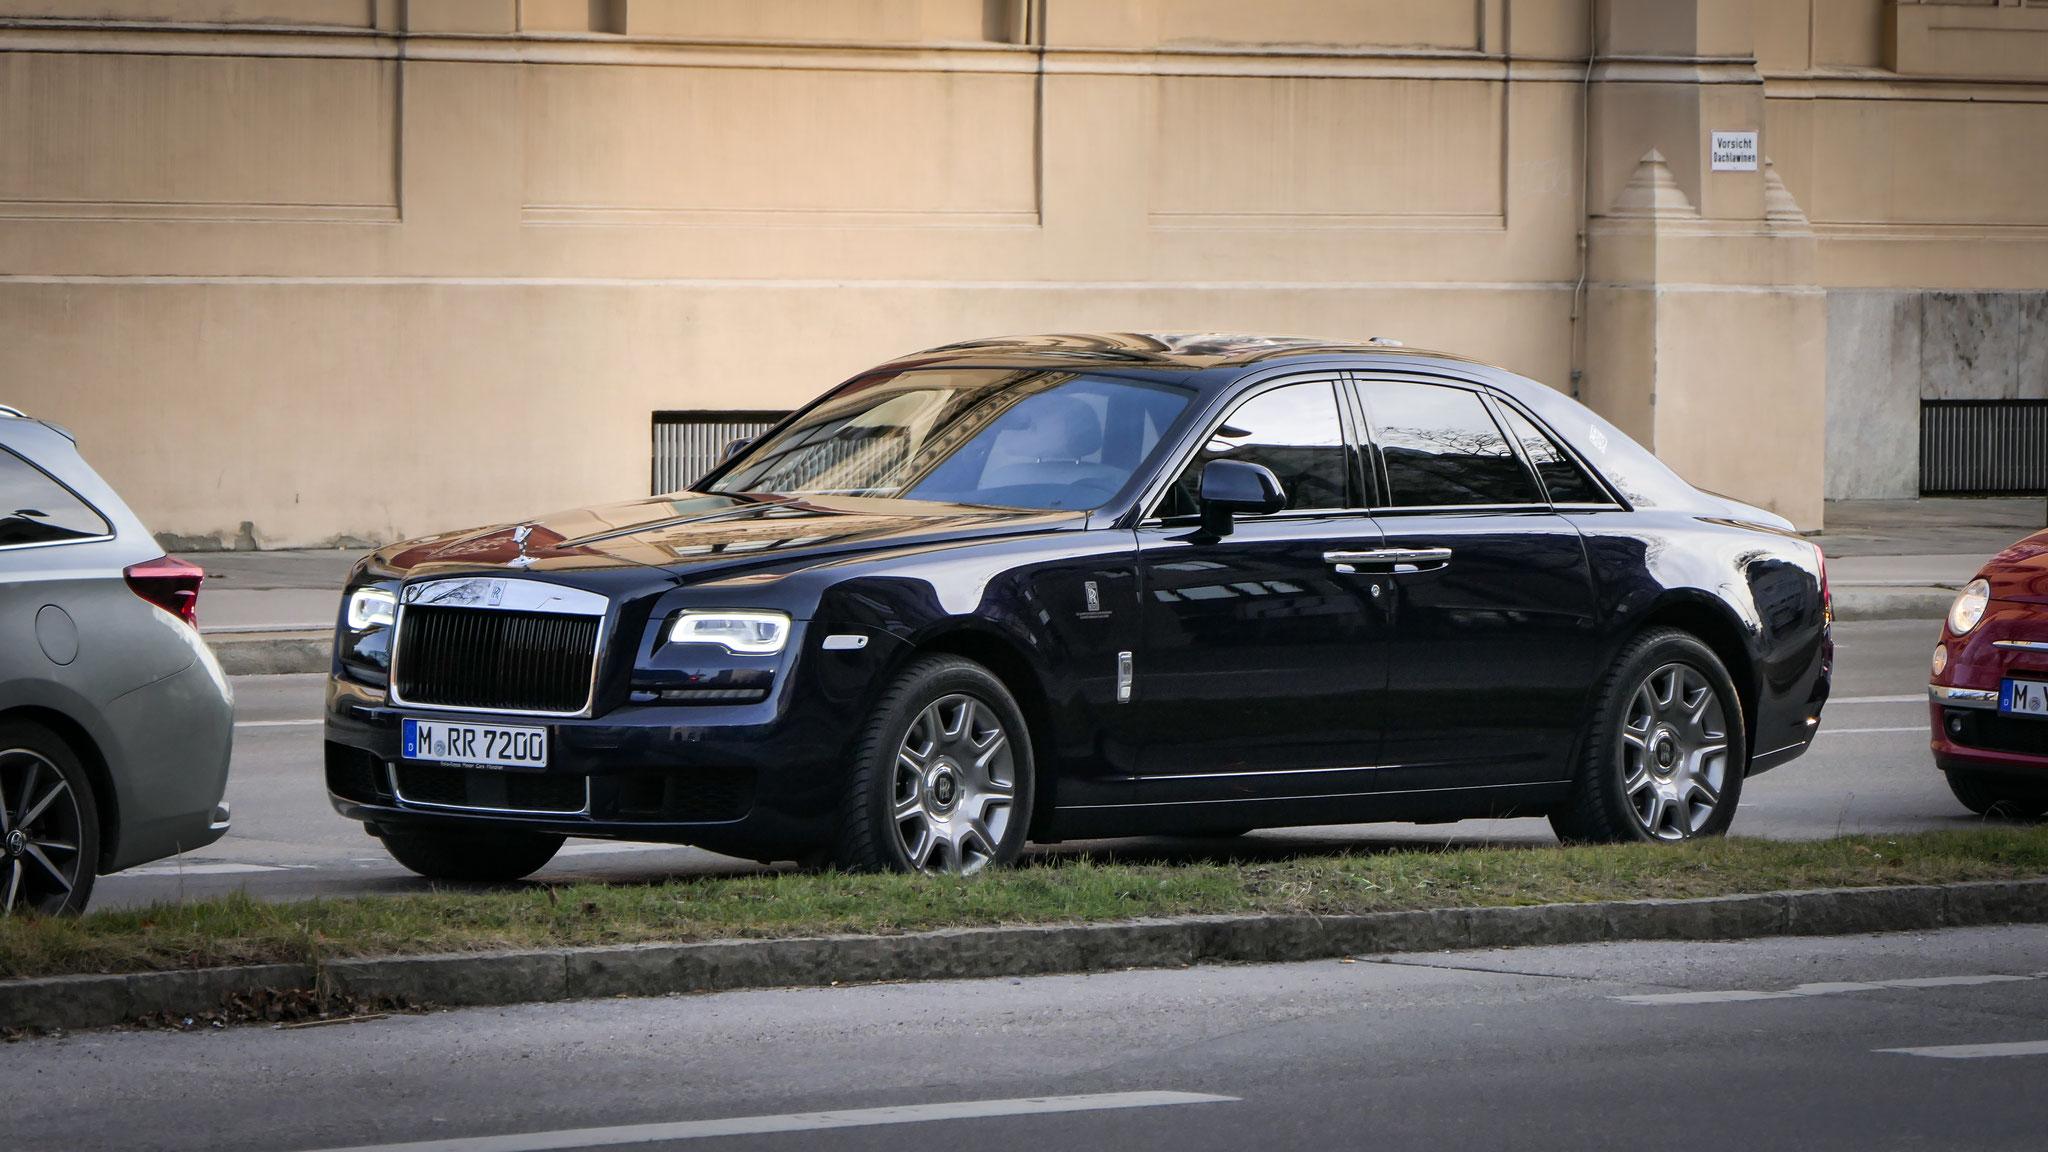 Rolls Royce Ghost Series II - M-RR-7200